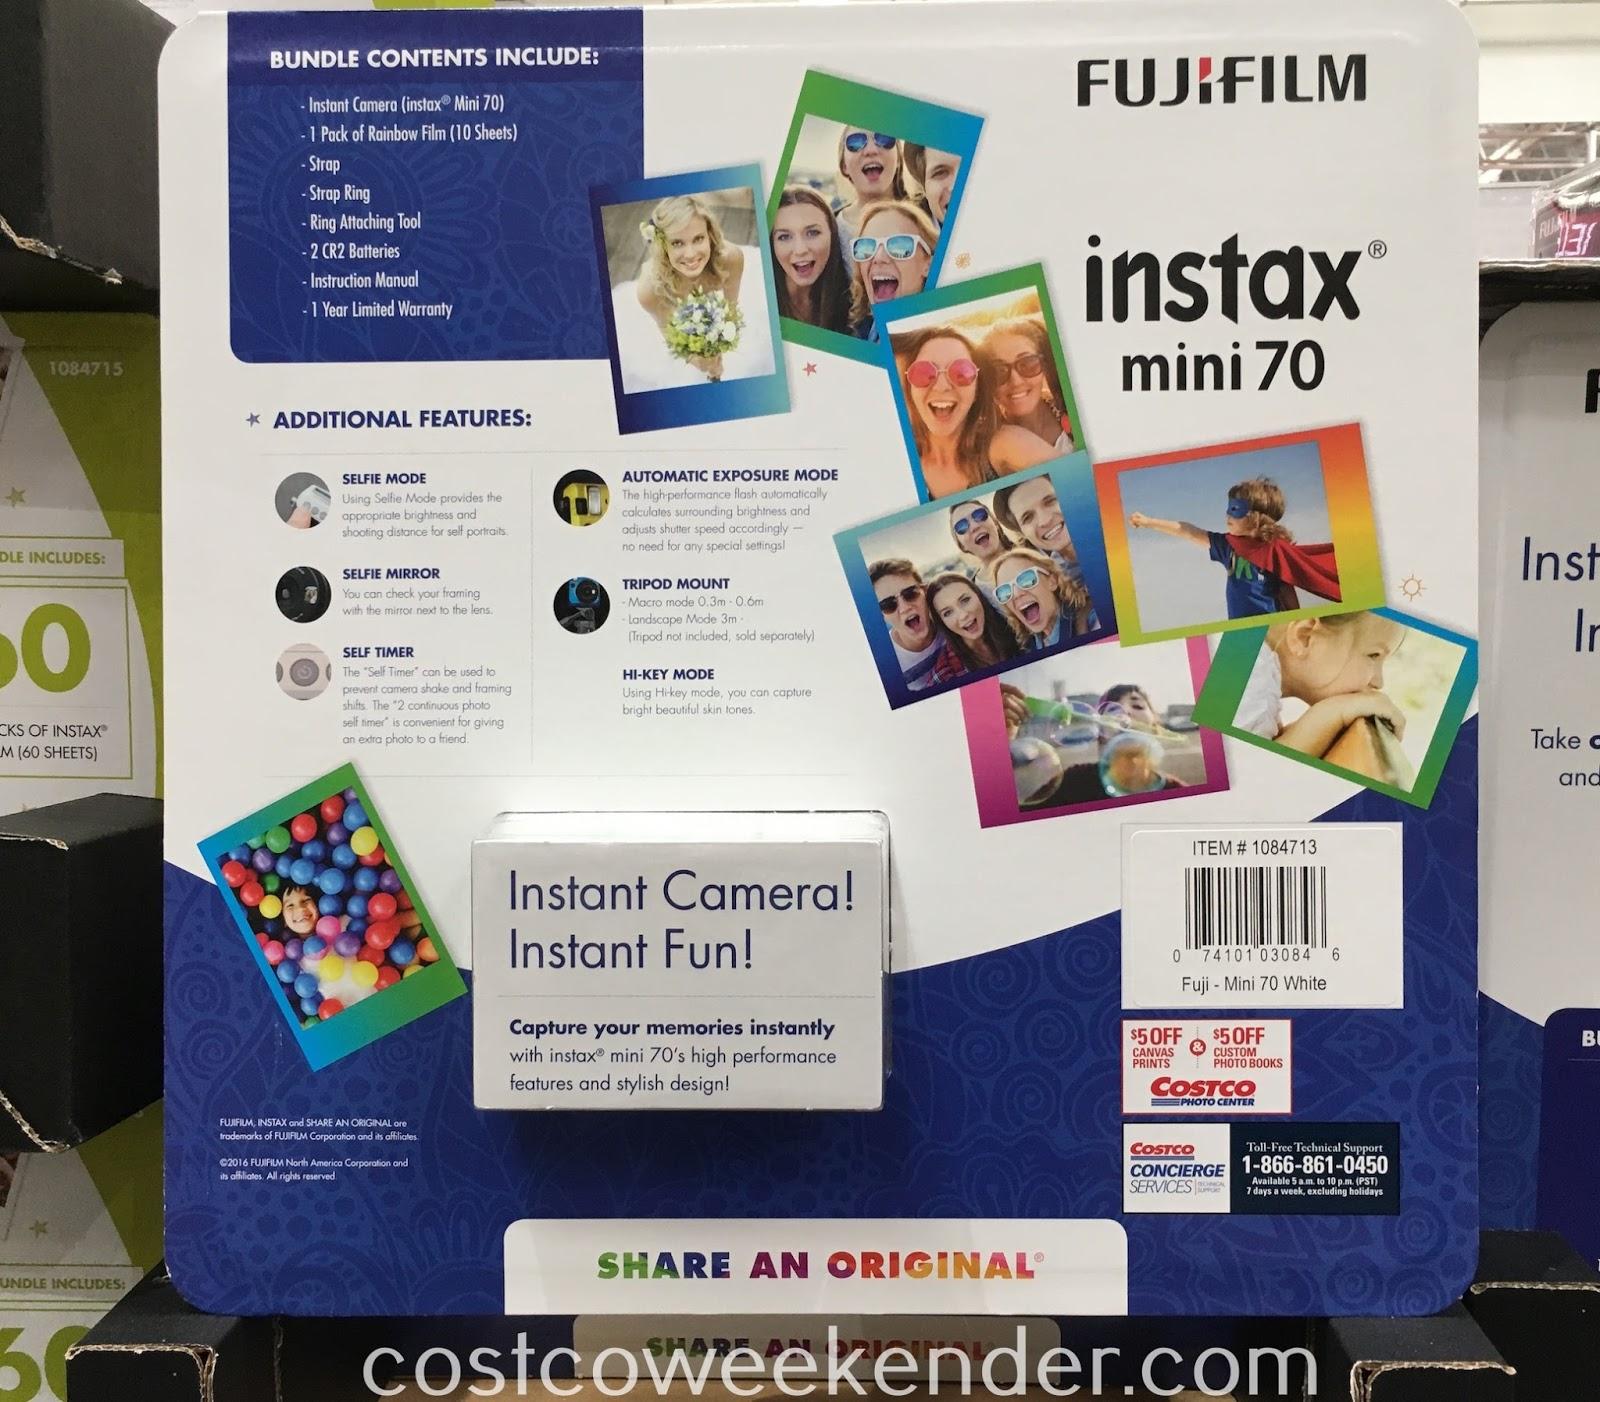 Costco 1084713 - Fujifilm instax Mini 70 Instant Camera - this generation's Polaroid